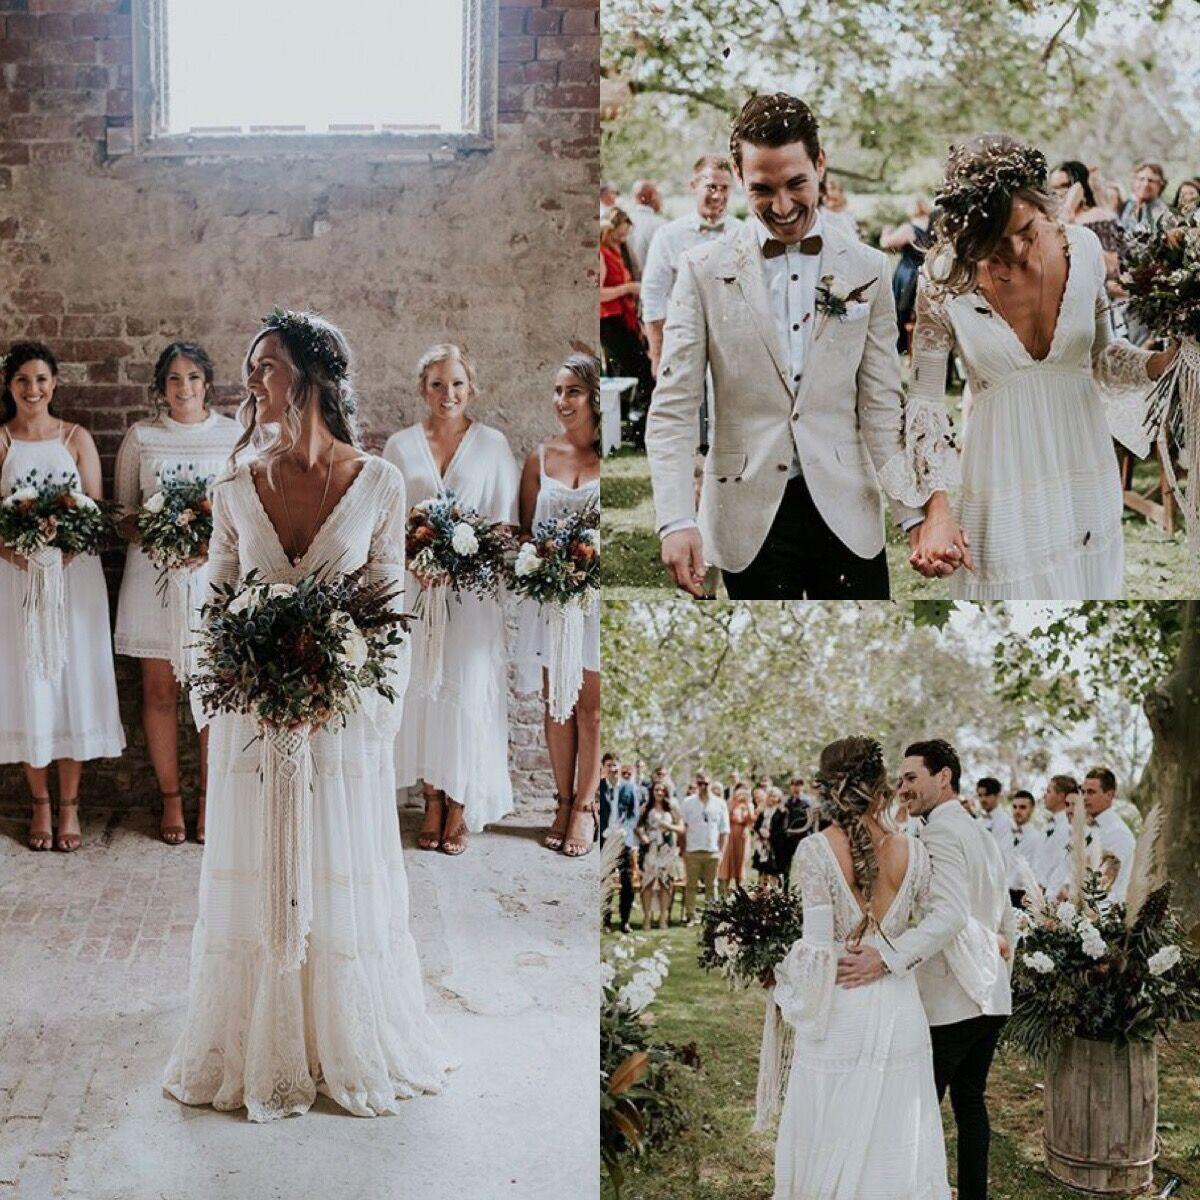 Discount Vintage Lace 2017 Wedding Dresses Plunging Neckline Bubble Sleeve Backless Gowns Floor Length A Line Plus Size Bridal Gown Bride